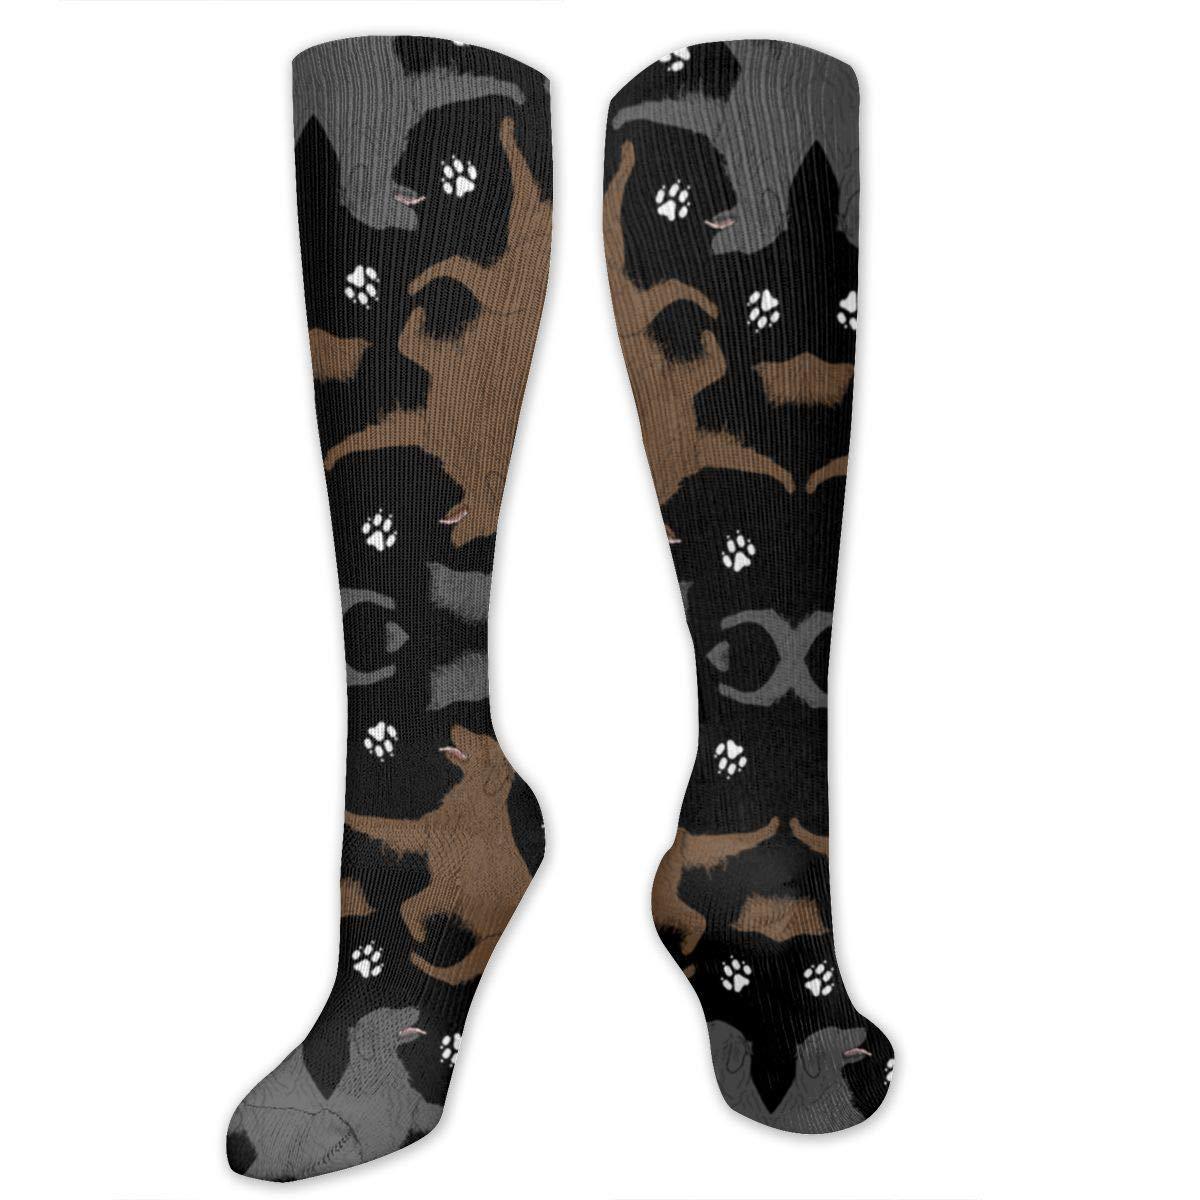 NAQSOCKSLE Trotting Flat Coated Retrievers And Paw Soft Cotton Socks Unisex Crew Crew Socks Suitable For Jogging